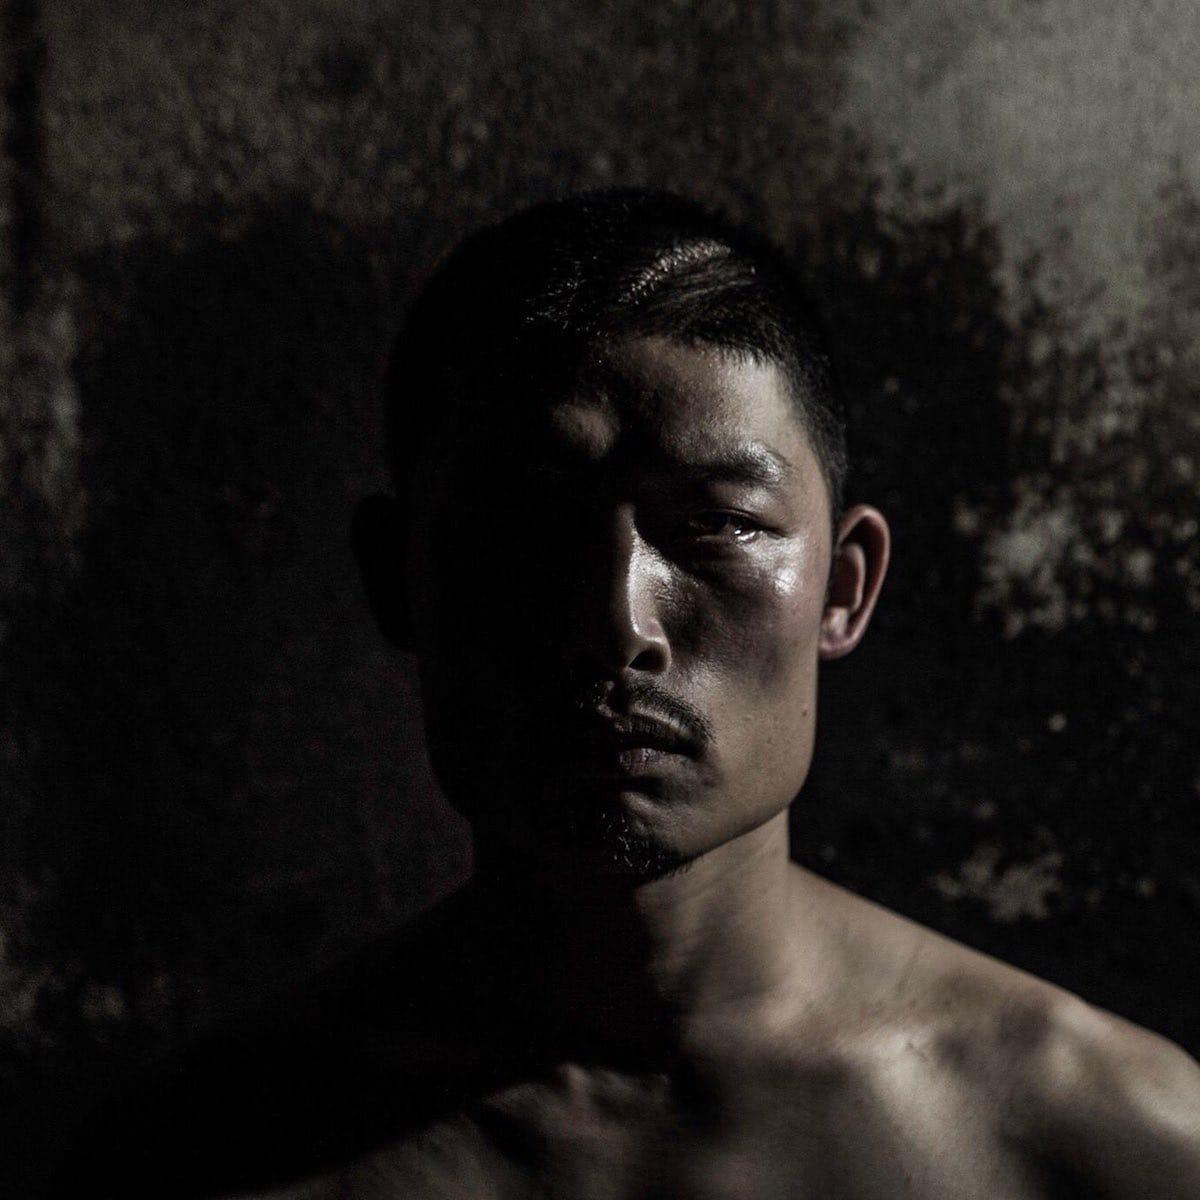 <THE M/ALL>第二弾出演者にコムアイやBudaMunk、行松陽介、MOMENT JOON、odd eyesらが決定 art_culture180410_themall_5-1200x1200